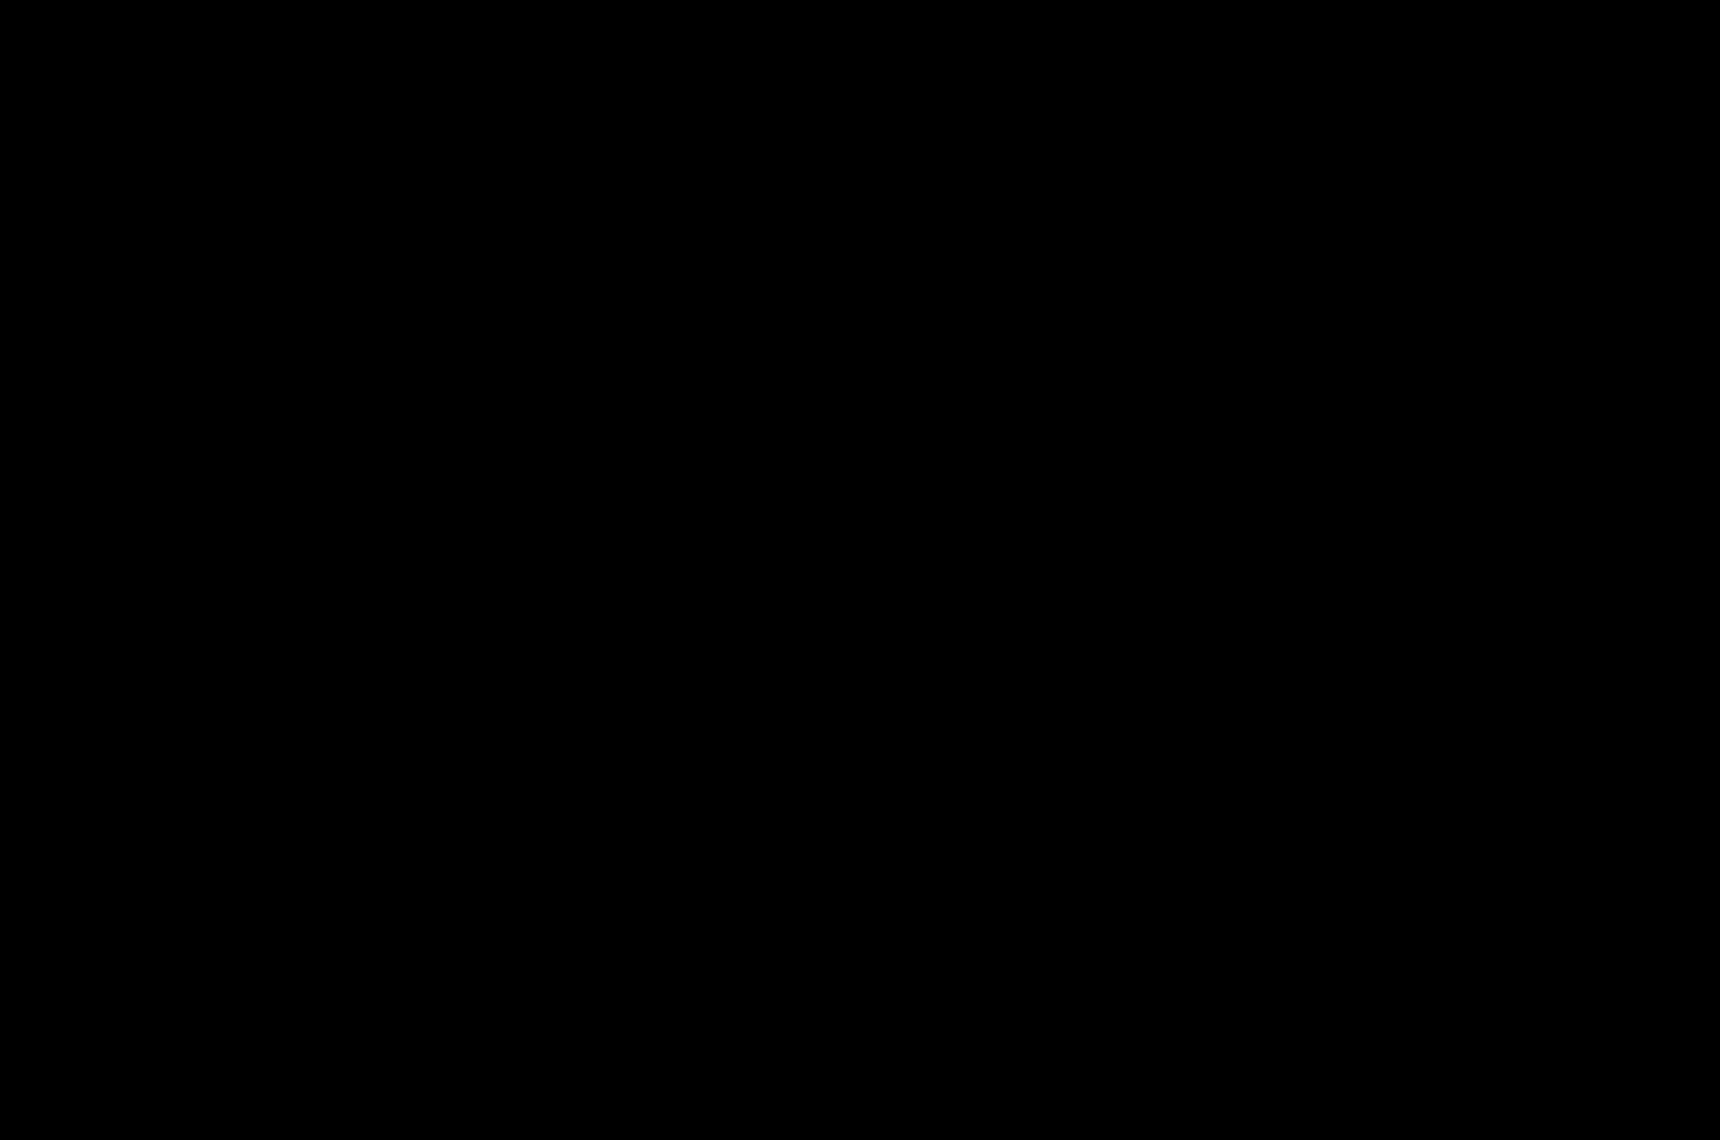 [45+] Plain Black Wallpapers HD on WallpaperSafari